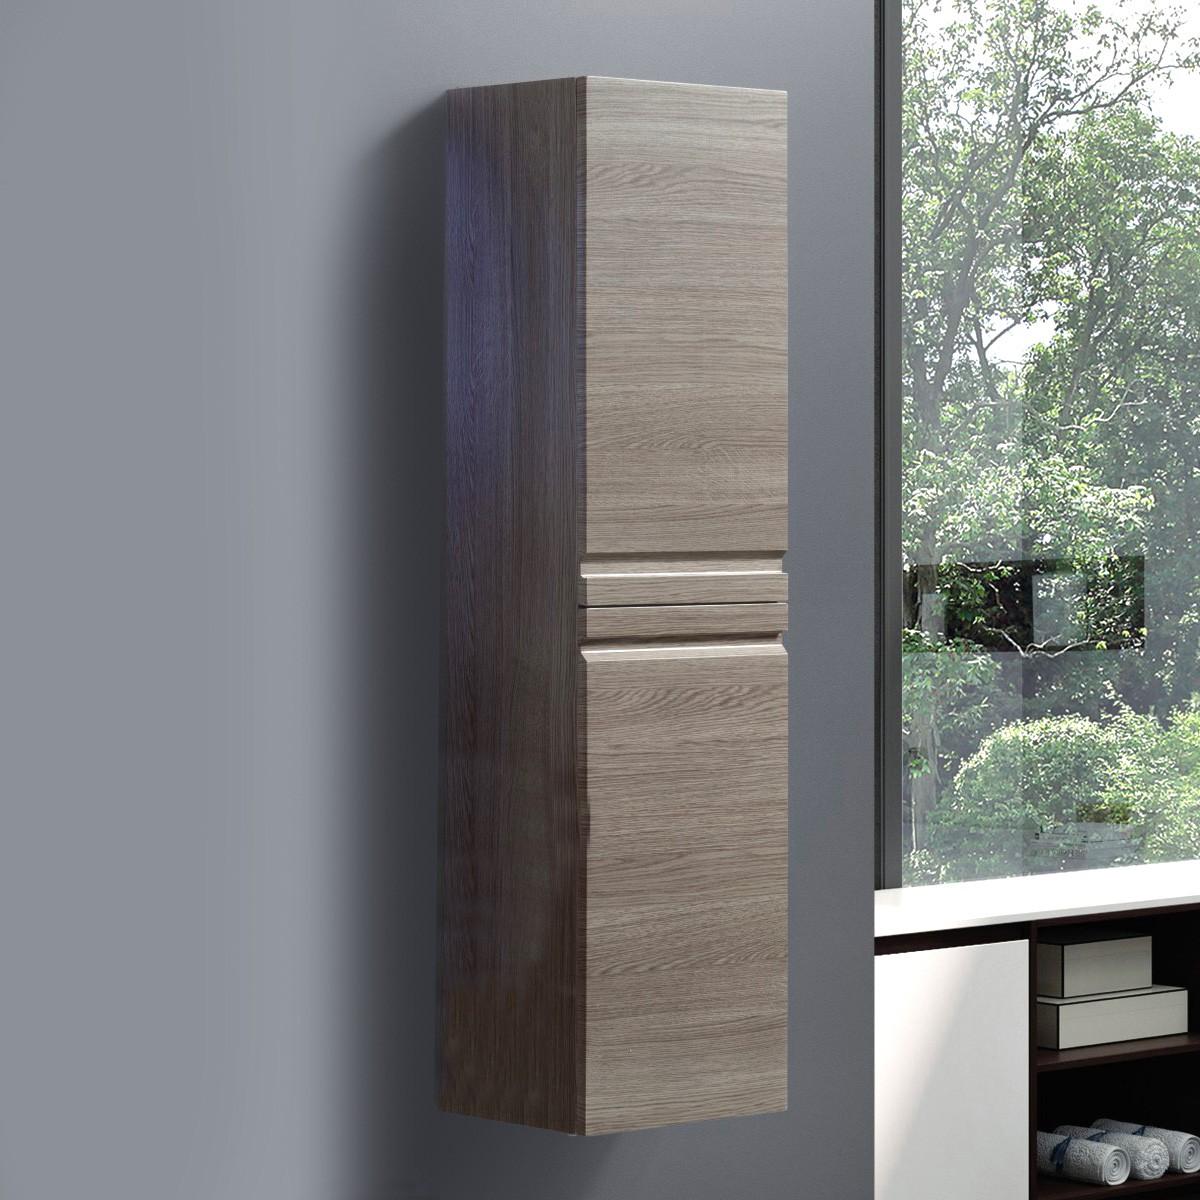 16 x 60 In. Wall Mount Linen Cabinet (ZRW8002-S)